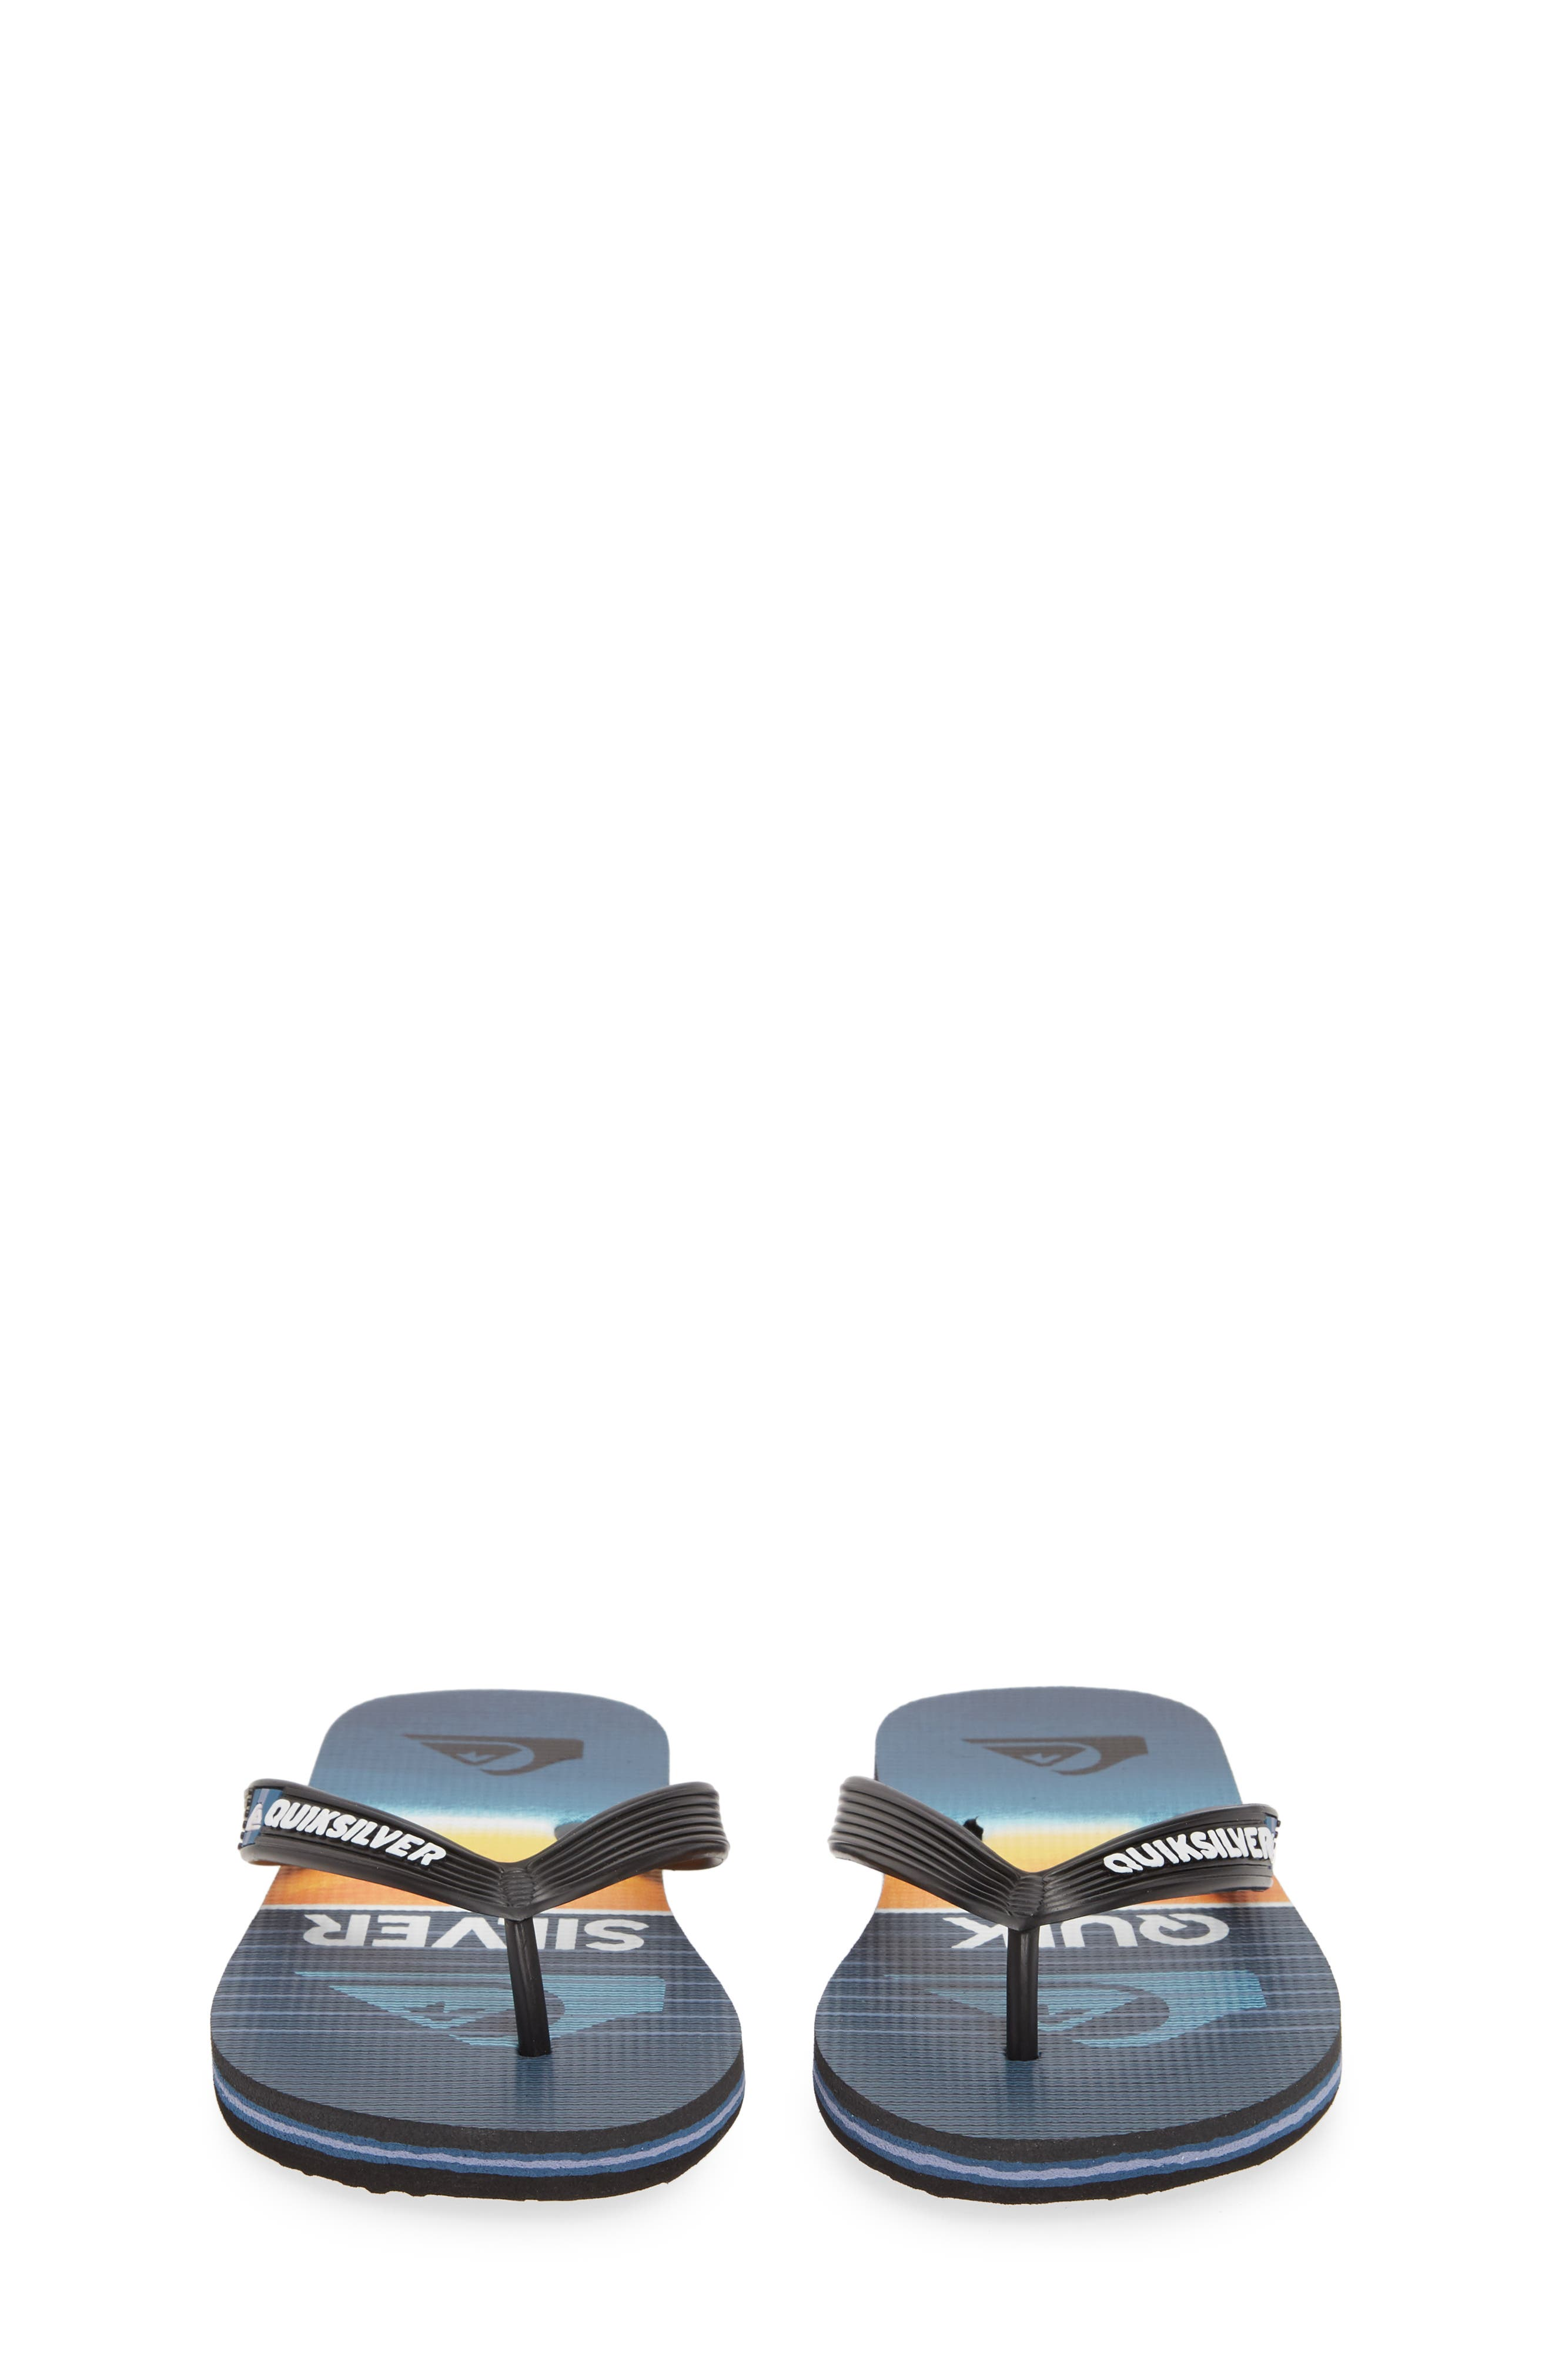 QUIKSILVER, Highline Slab Flip Flop, Alternate thumbnail 5, color, BLACK/ BLUE/ BLUE